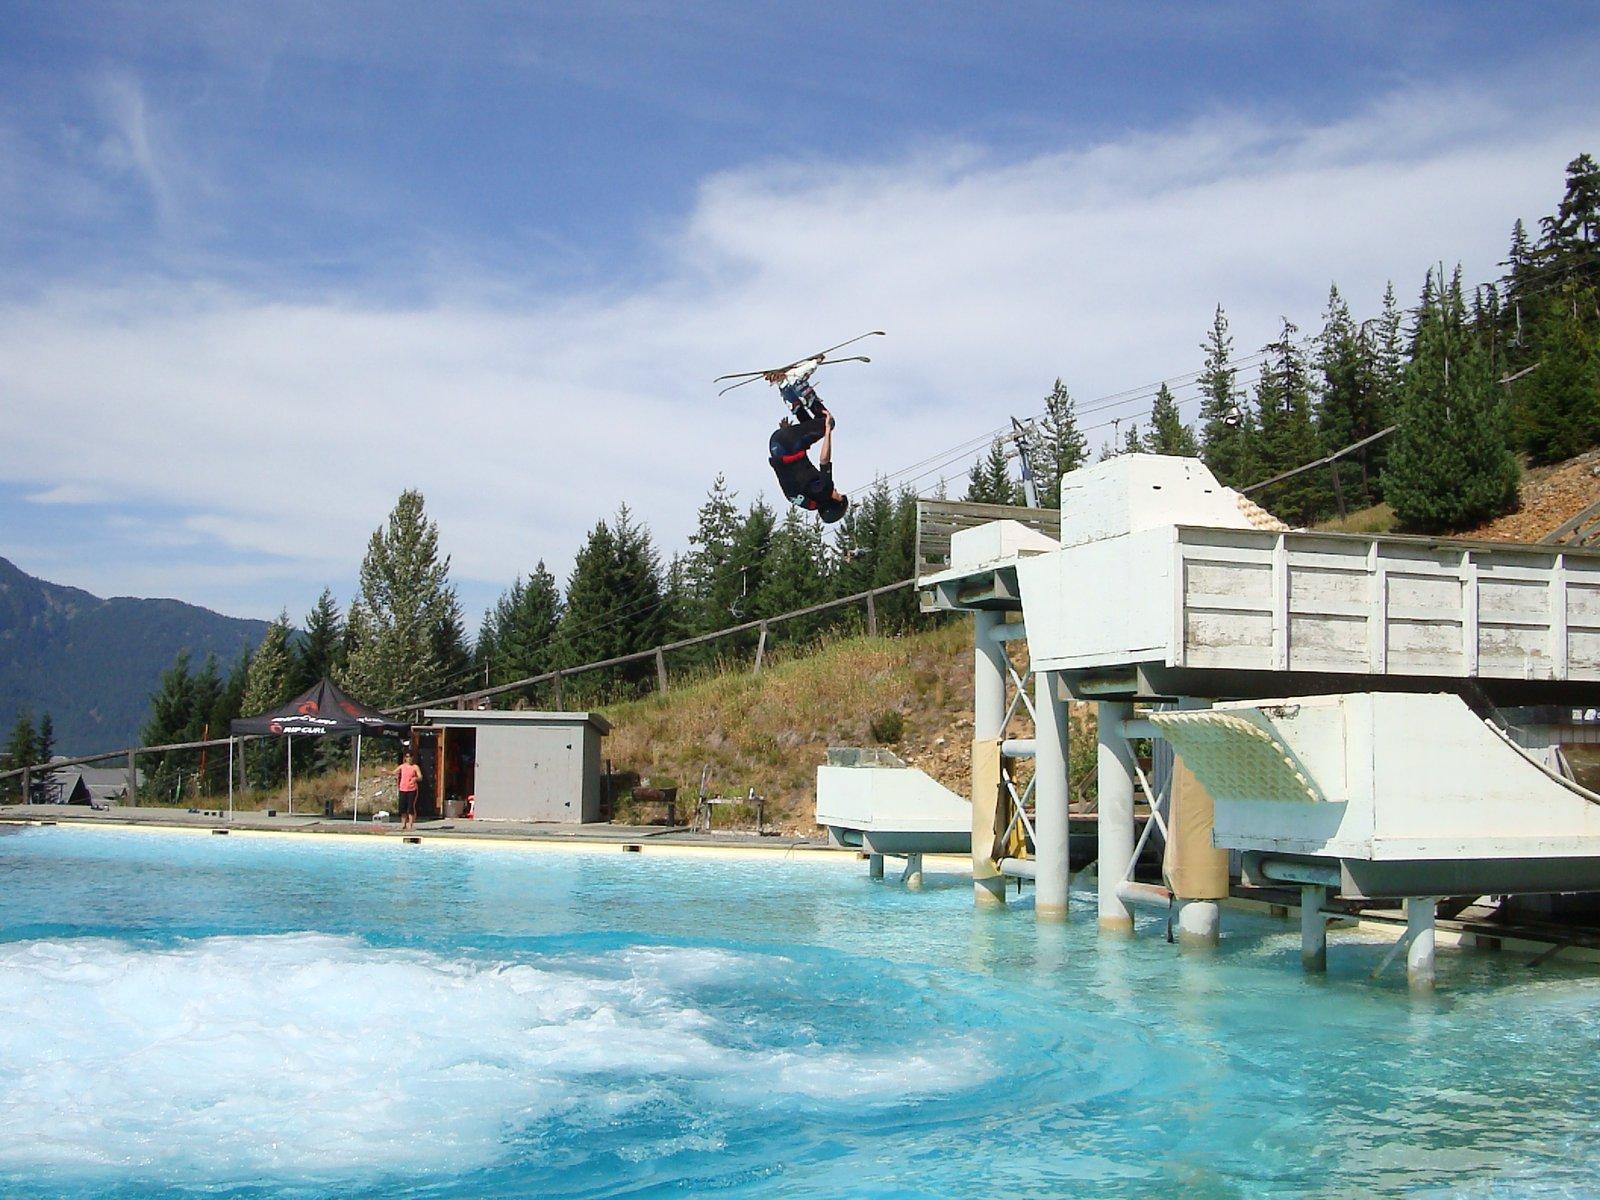 Whistler Freestyle Training Ramp -Summer Camp